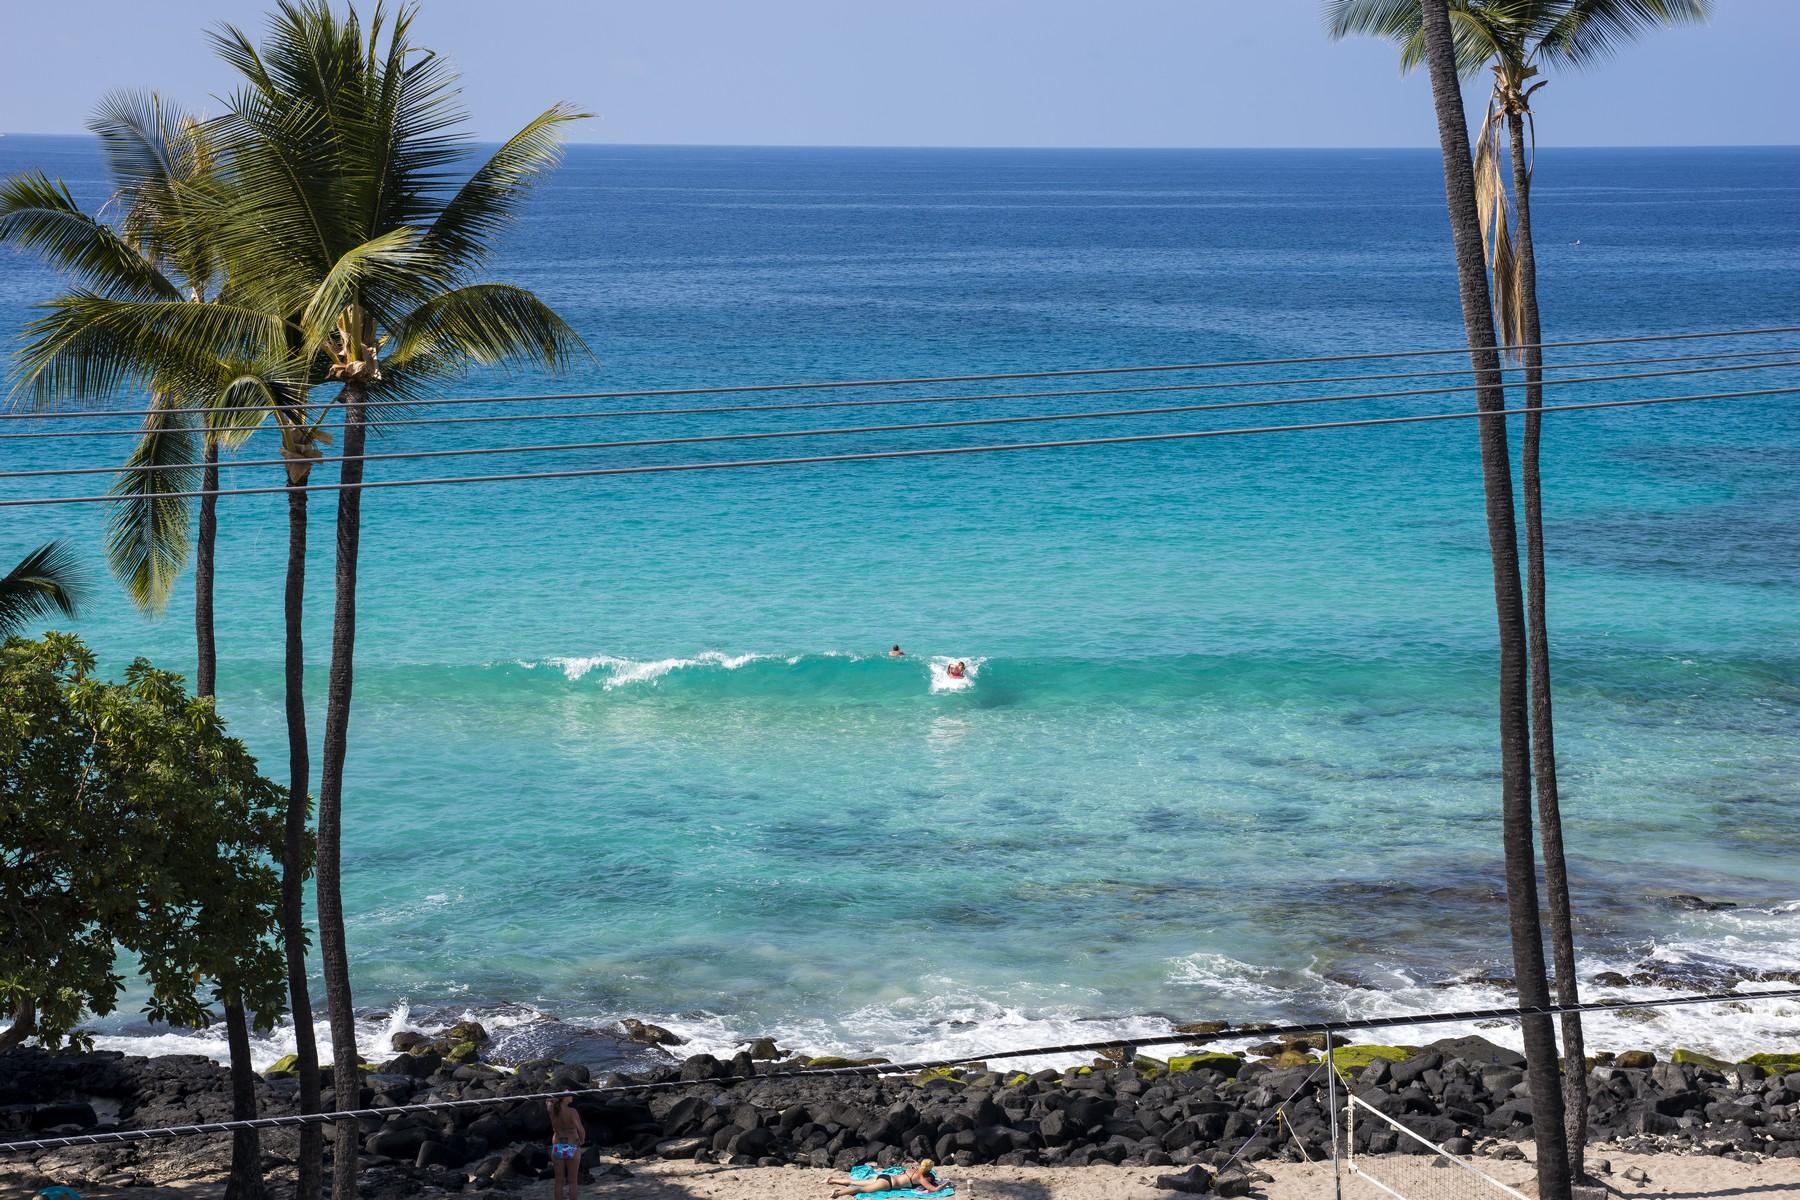 Condominium for Sale at White Sands Village 77-6469 Alii Dr. #109 Kailua-Kona, Hawaii 96740 United States